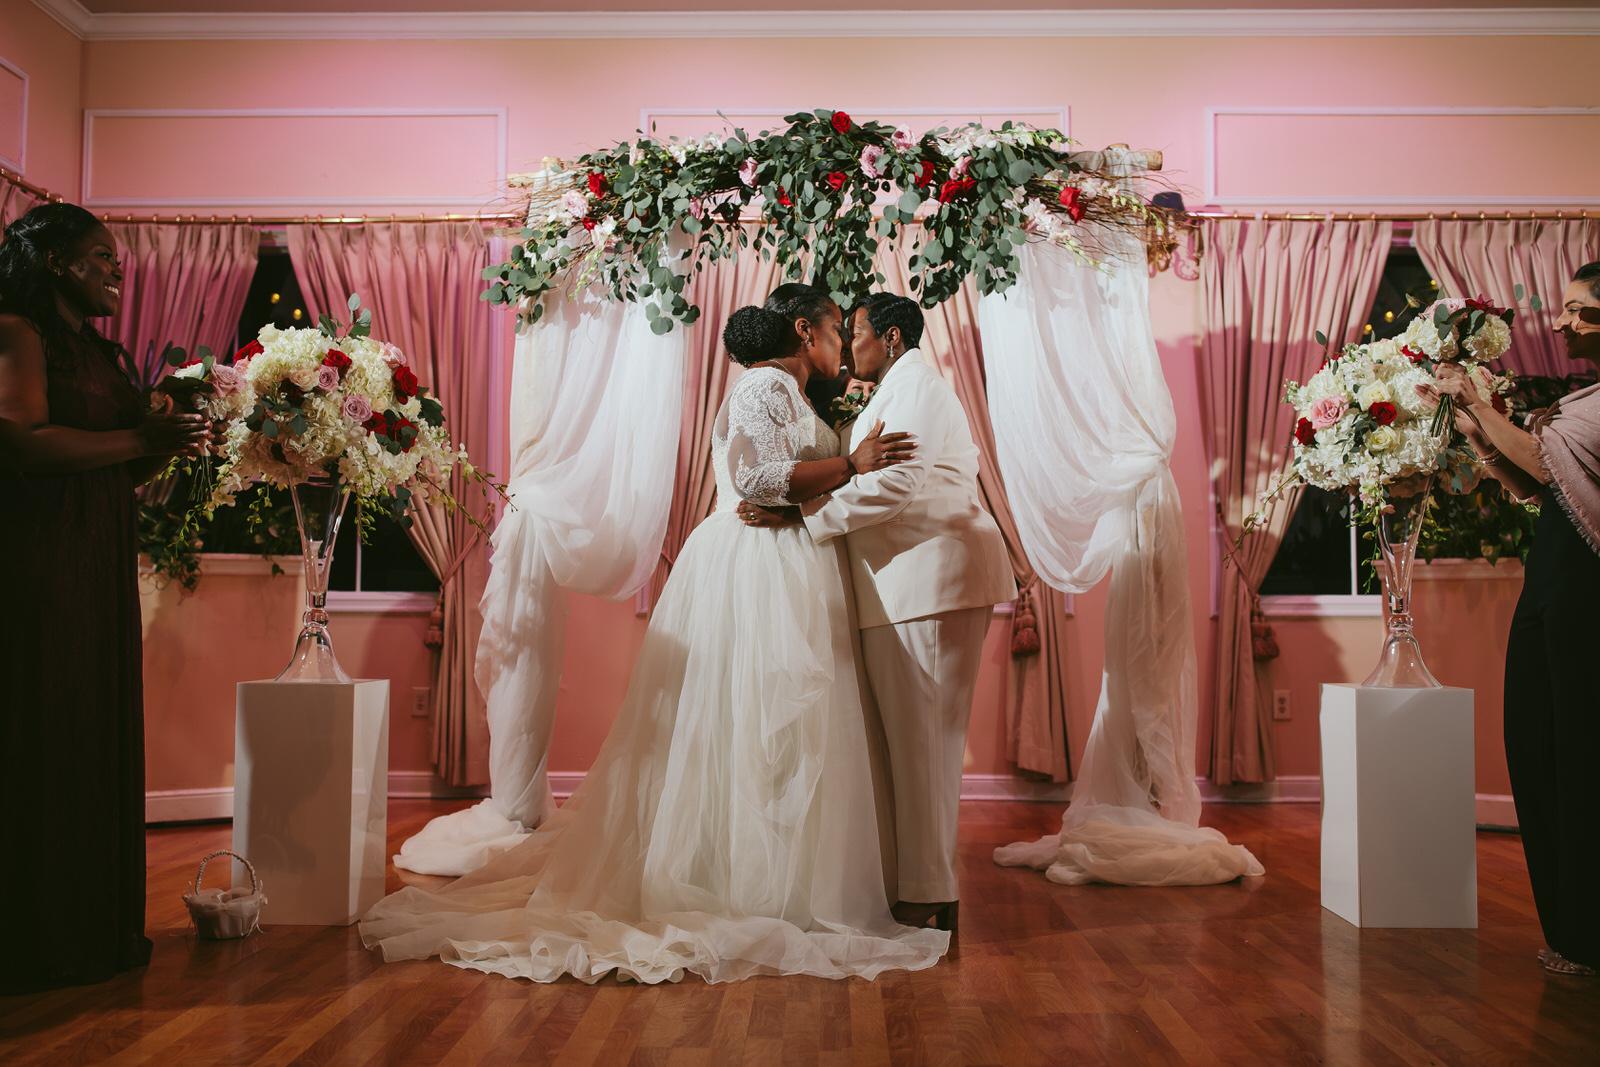 First_Kiss_Married_LGBTQ_Wedding_Photographer.jpg